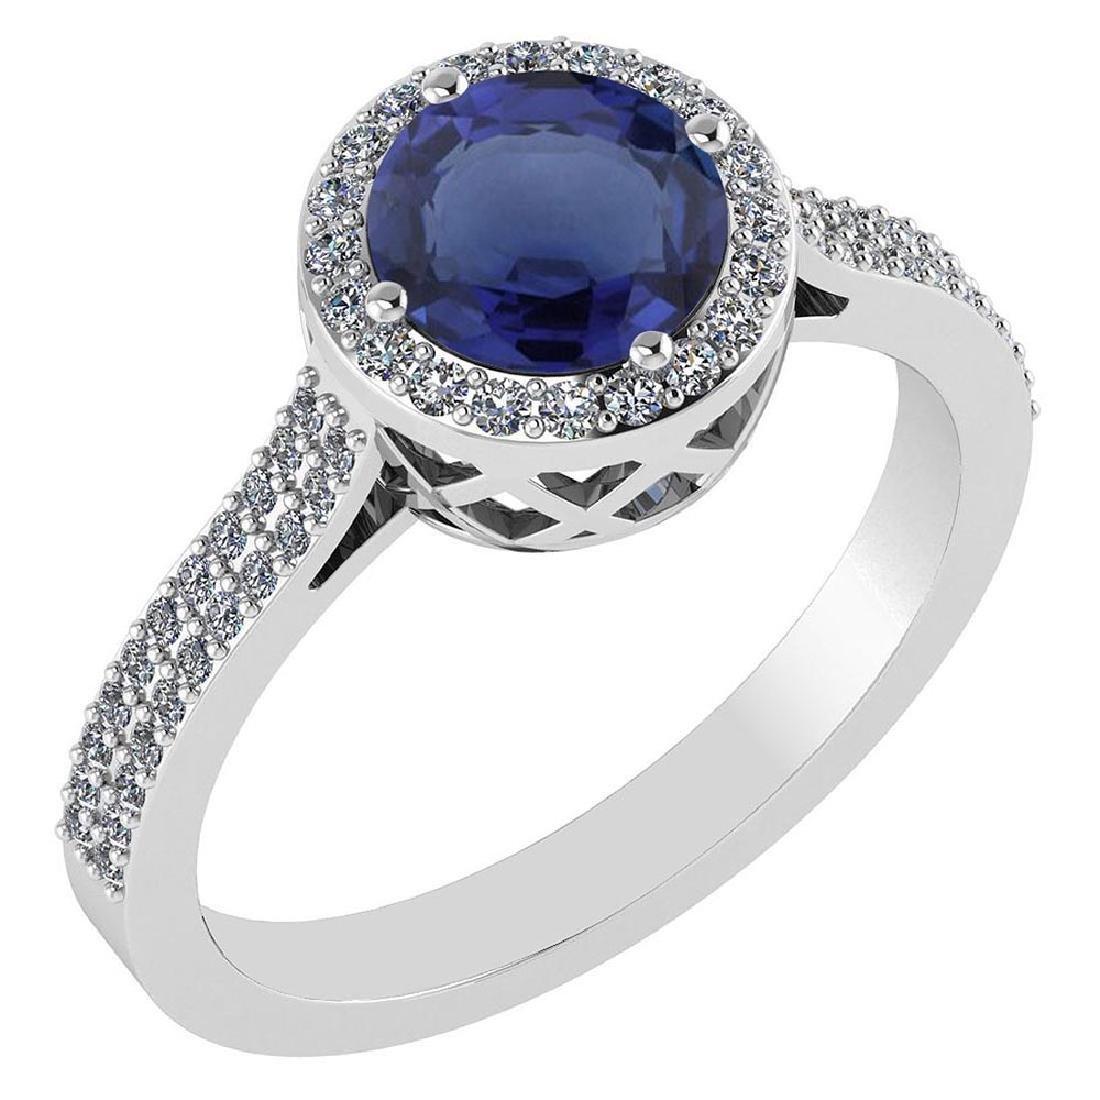 1.77 Ctw Blue Sapphire And Diamond 14k White Gold Halo